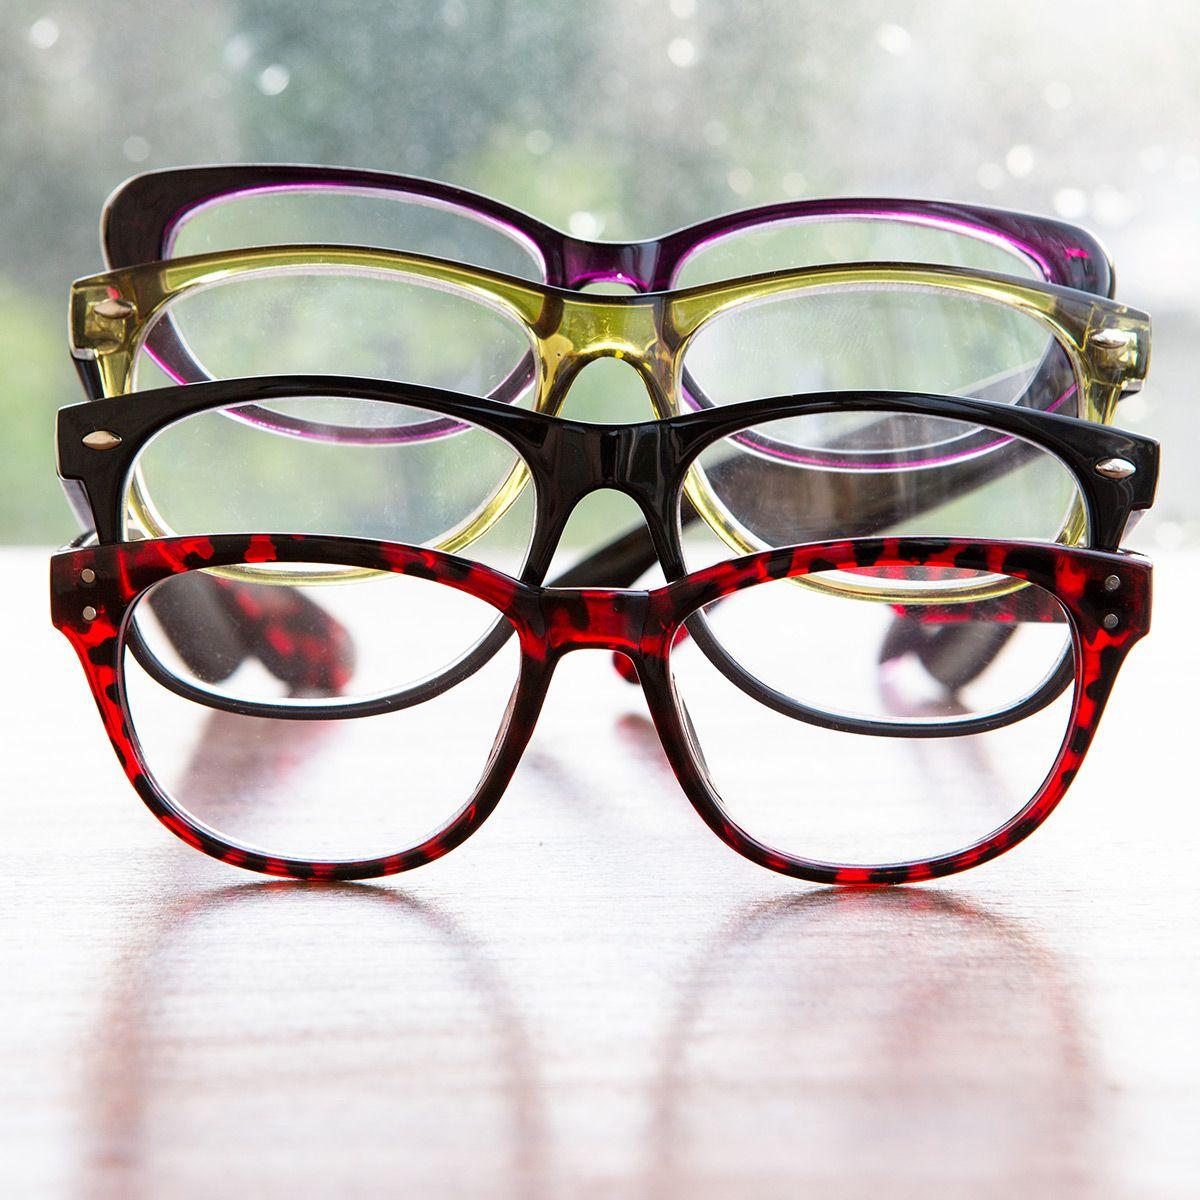 get eyeglasses online from a wide collection of 2000 eye glasses frames for men and - Wide Eyeglass Frames